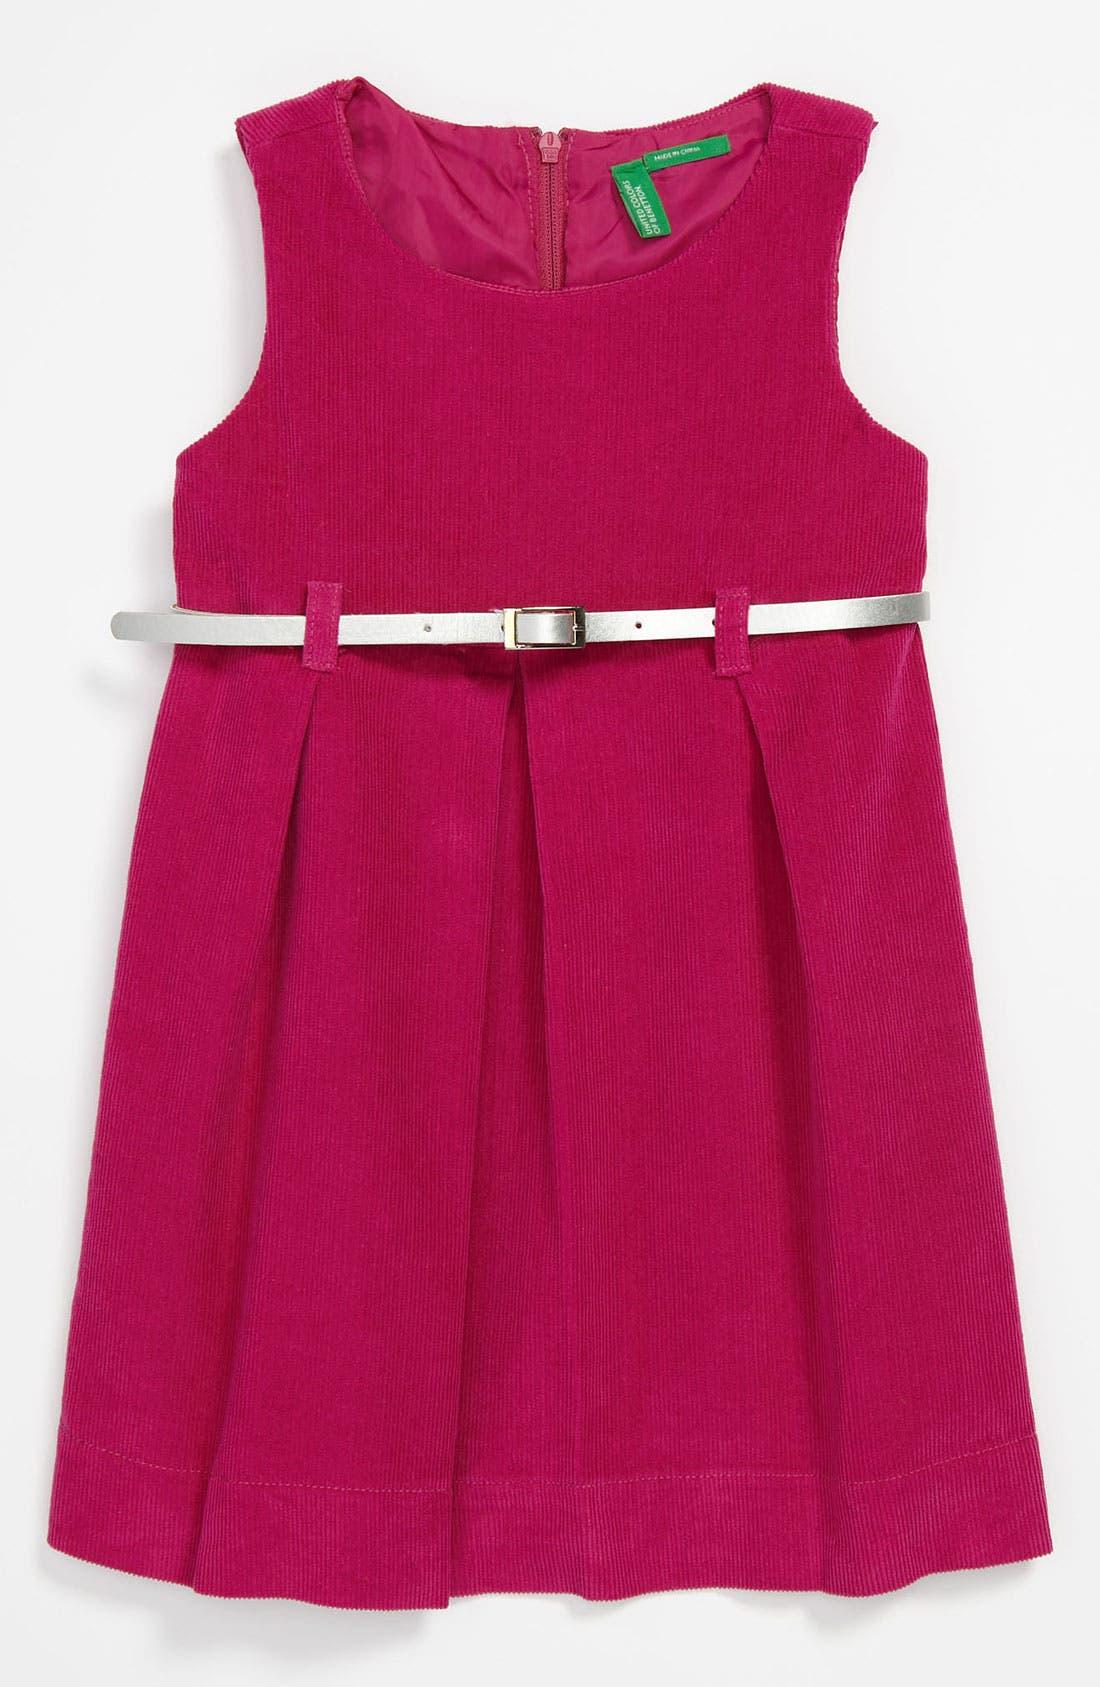 Alternate Image 1 Selected - United Colors of Benetton Kids Corduroy Dress (Infant)